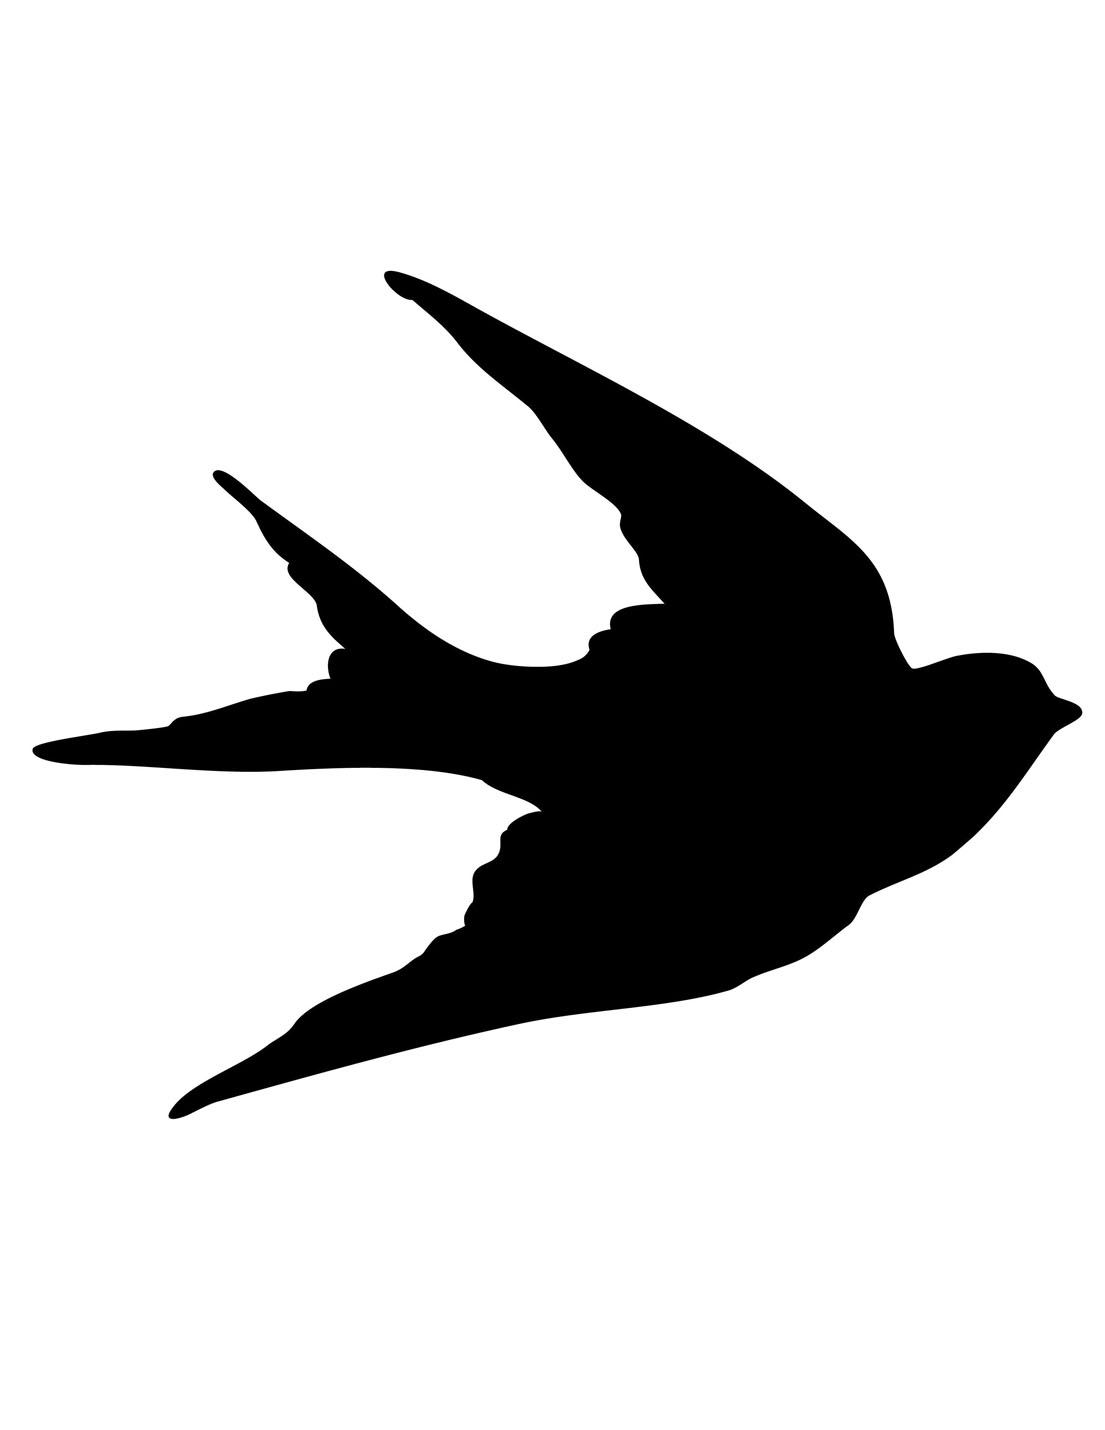 1105x1430 Bird Silhouettes Clip Art Public Domain Birds Bird Silhouettes